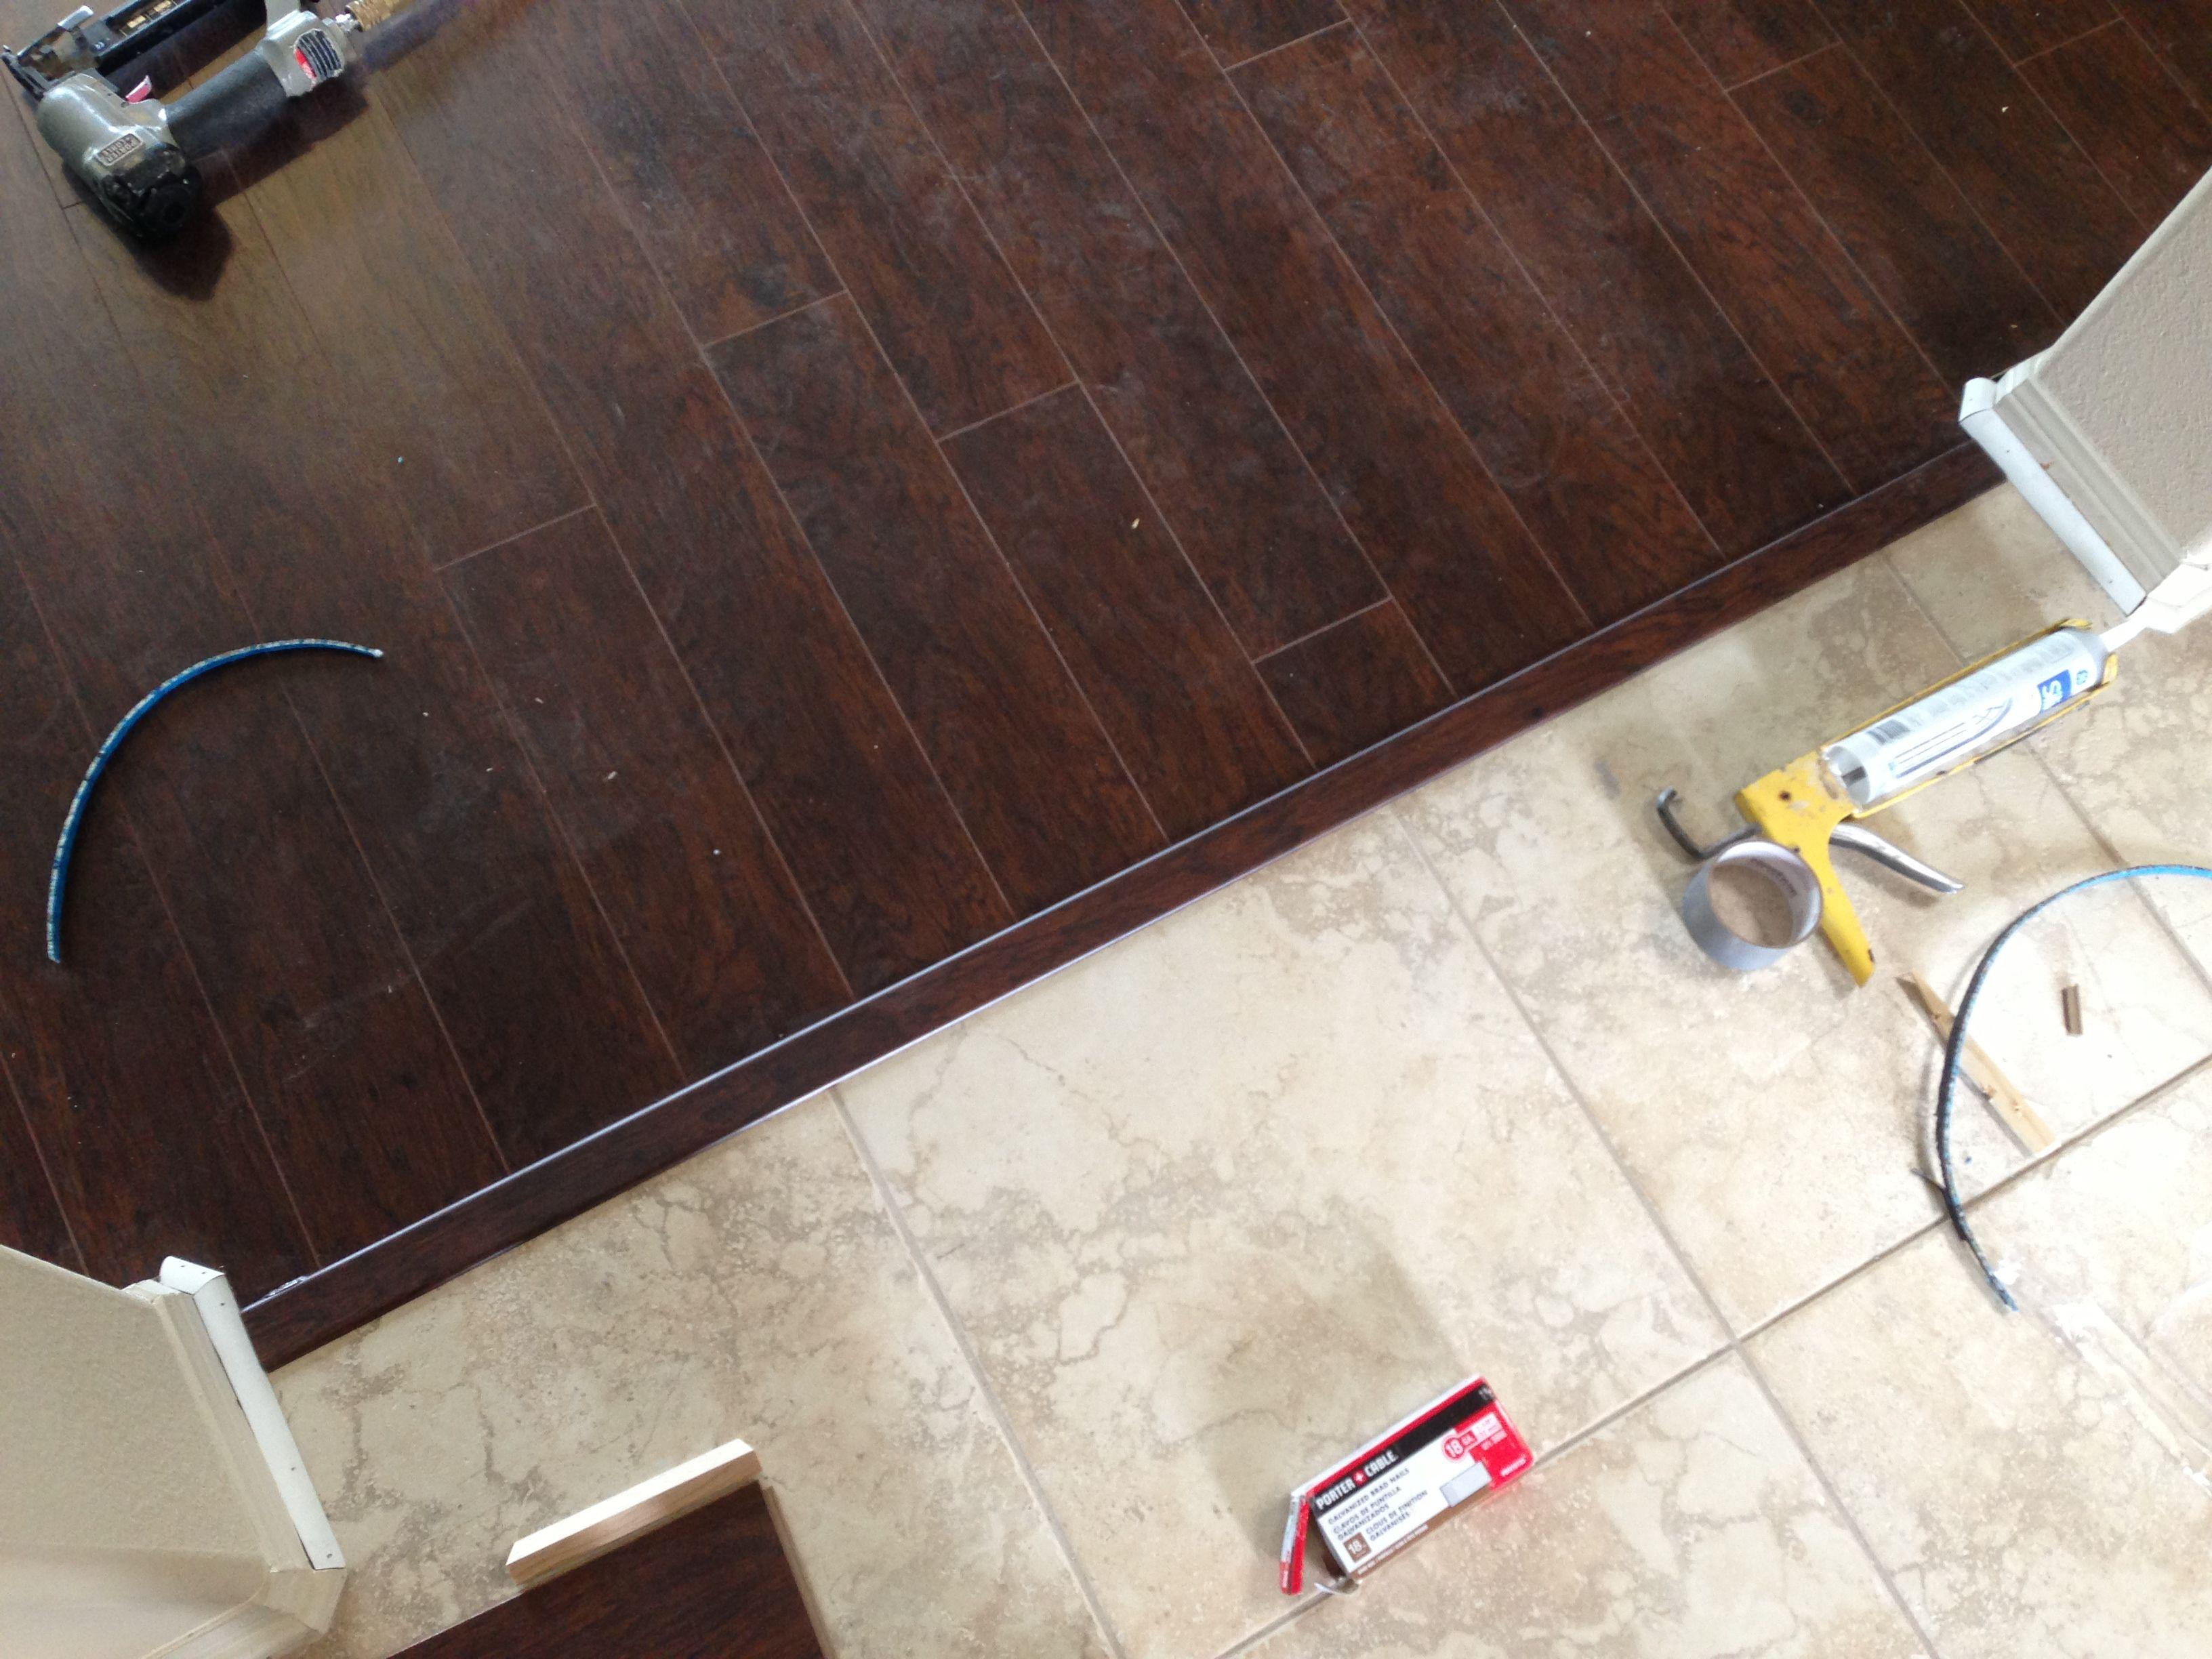 20 Dark Wood Floors Ideas Designing Your Home Diy Tile To Wood